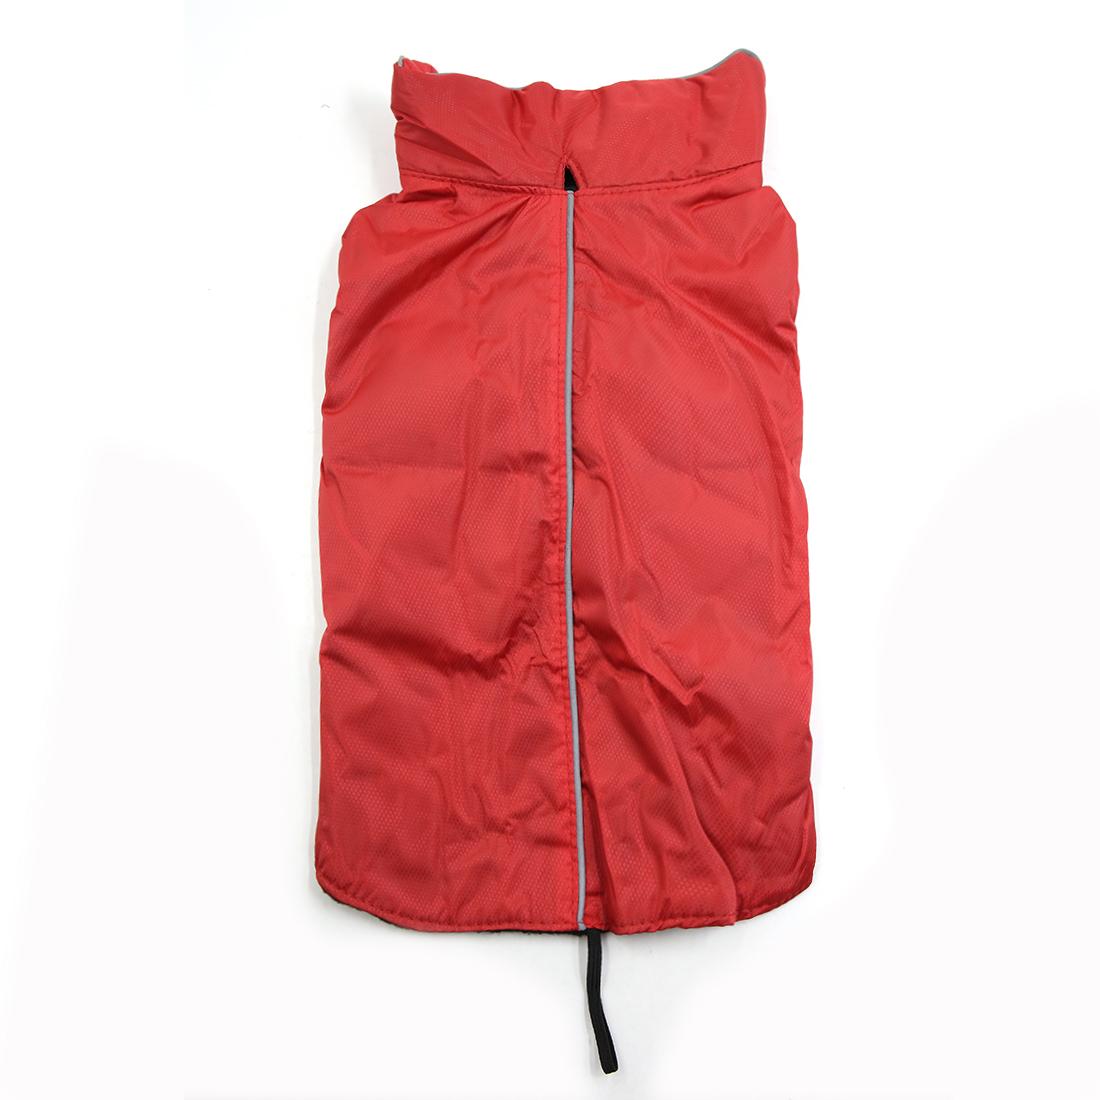 Reflective Vest Jacket Clothes Soft Warm Fleece Lining Dog Coat Clothing Red XXL